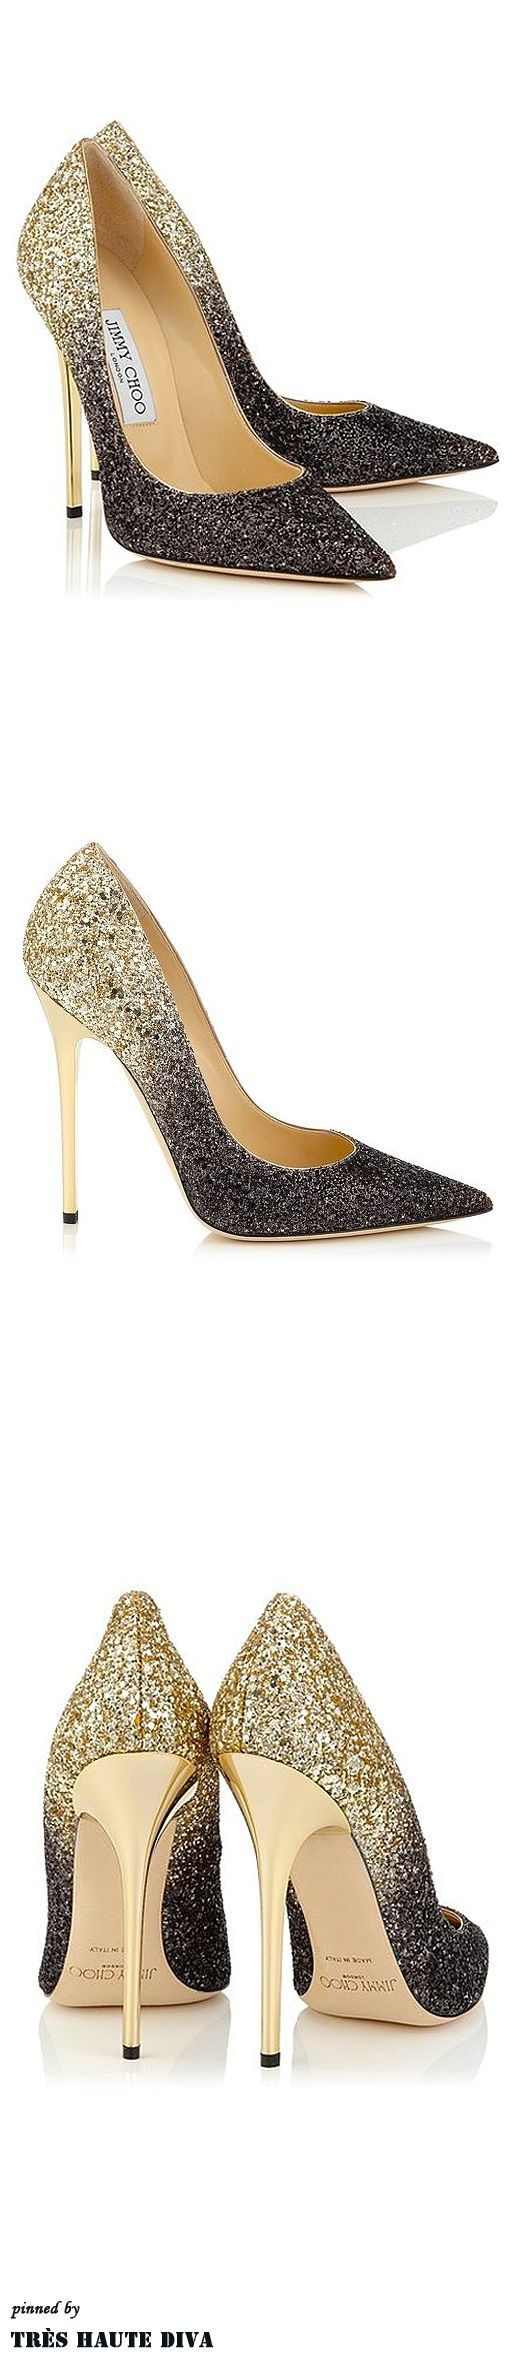 Best Women's High Heels : jimmy cho black gold glitter stilletto pointy heels